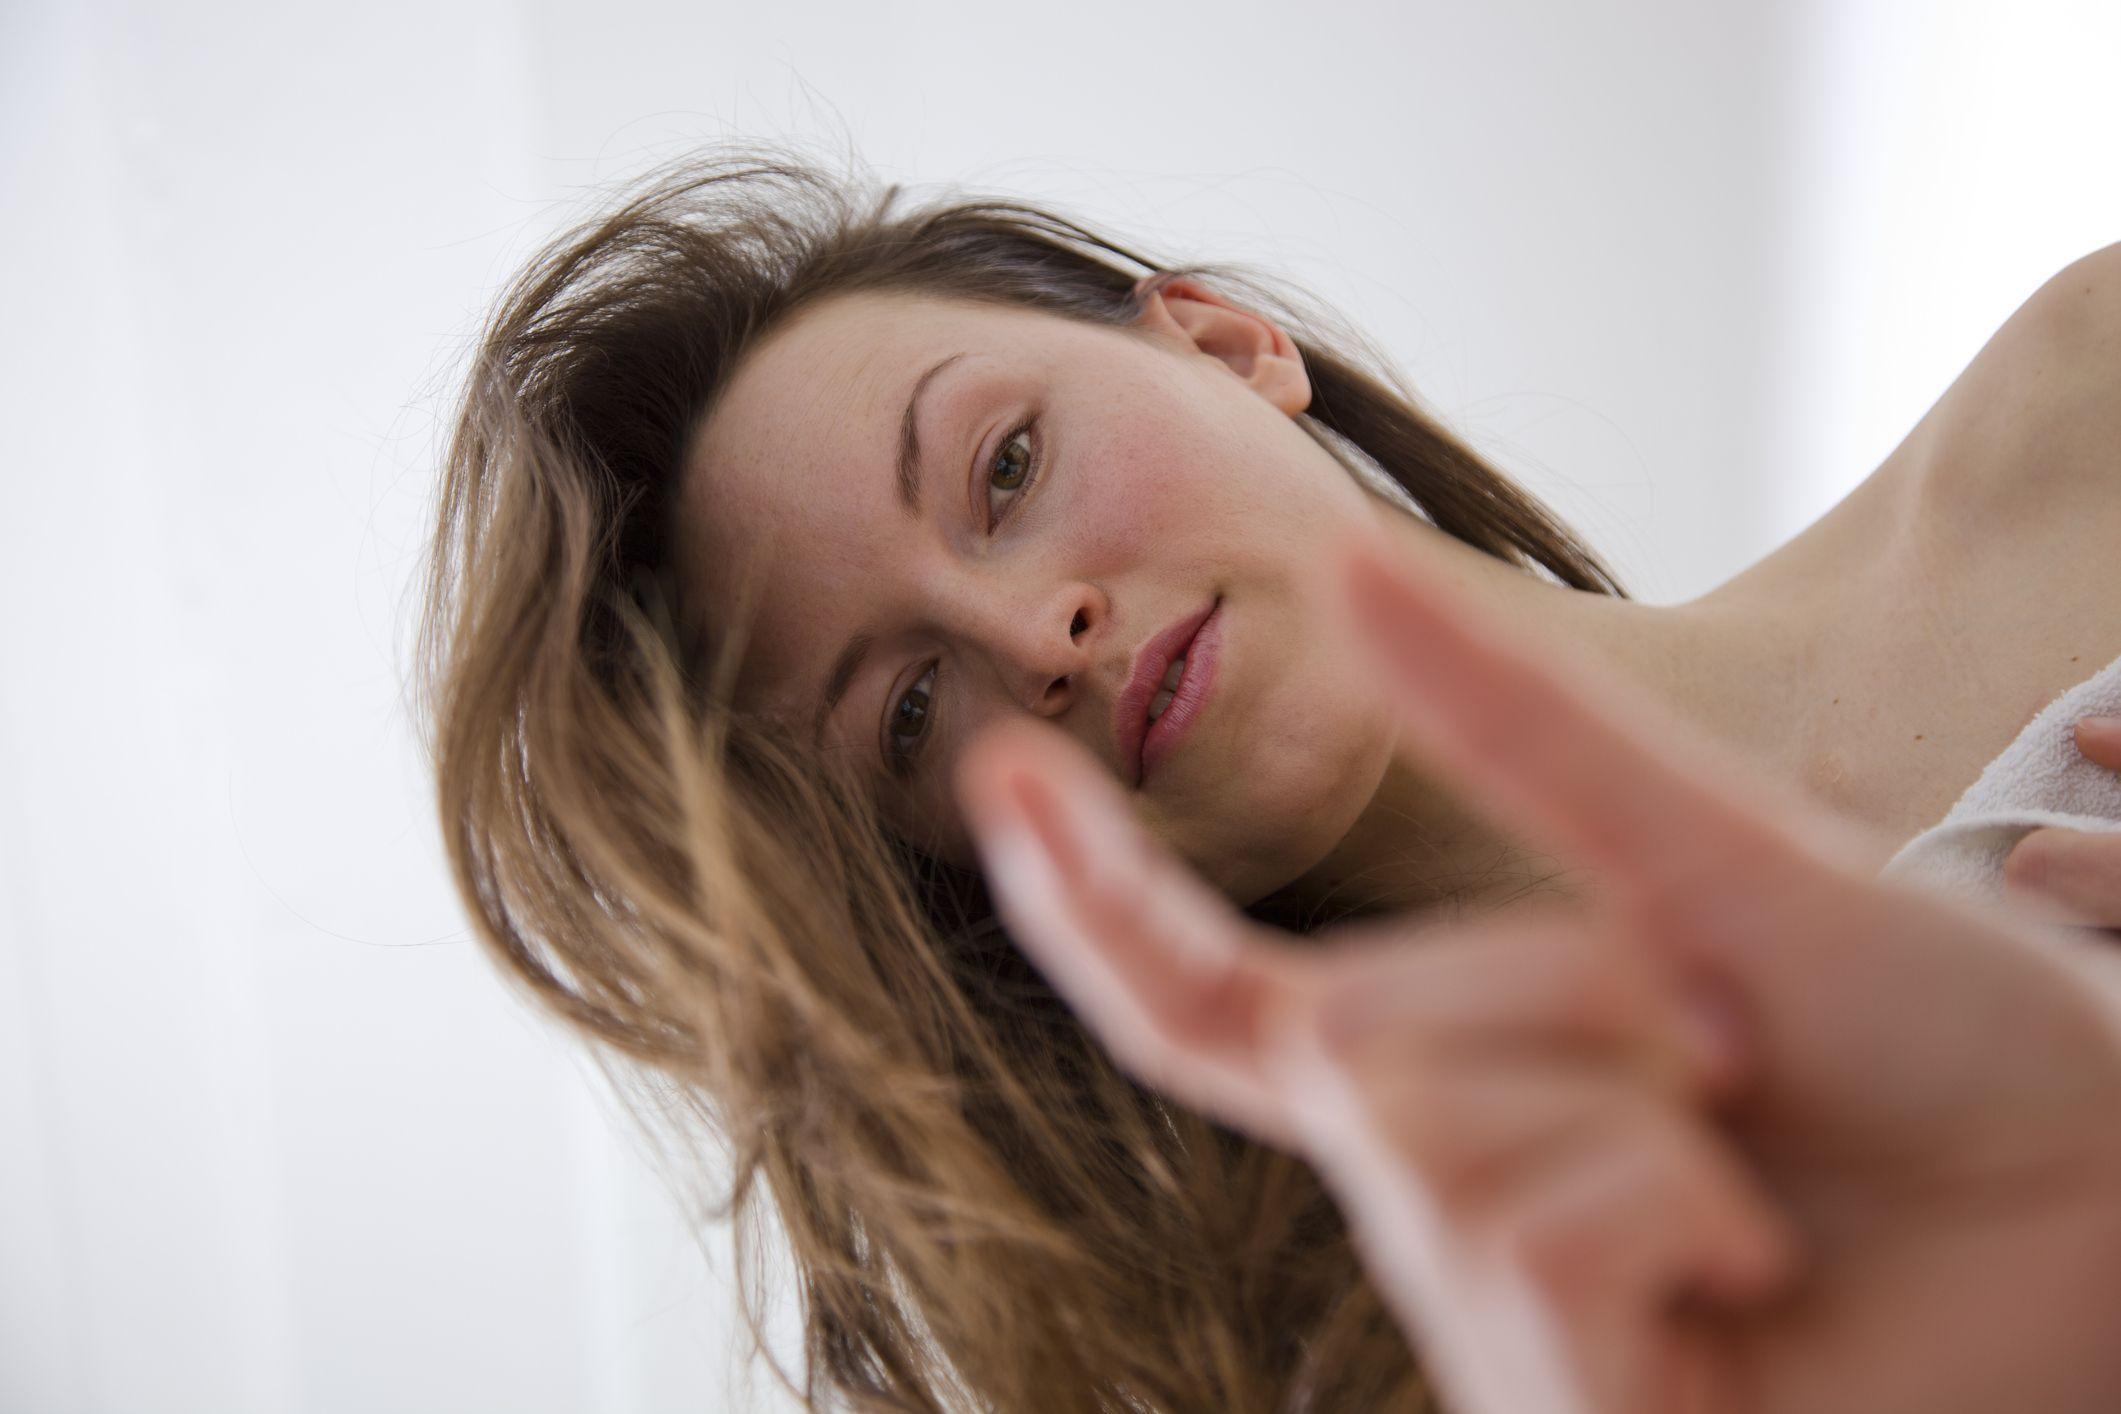 Why Women Tease Men